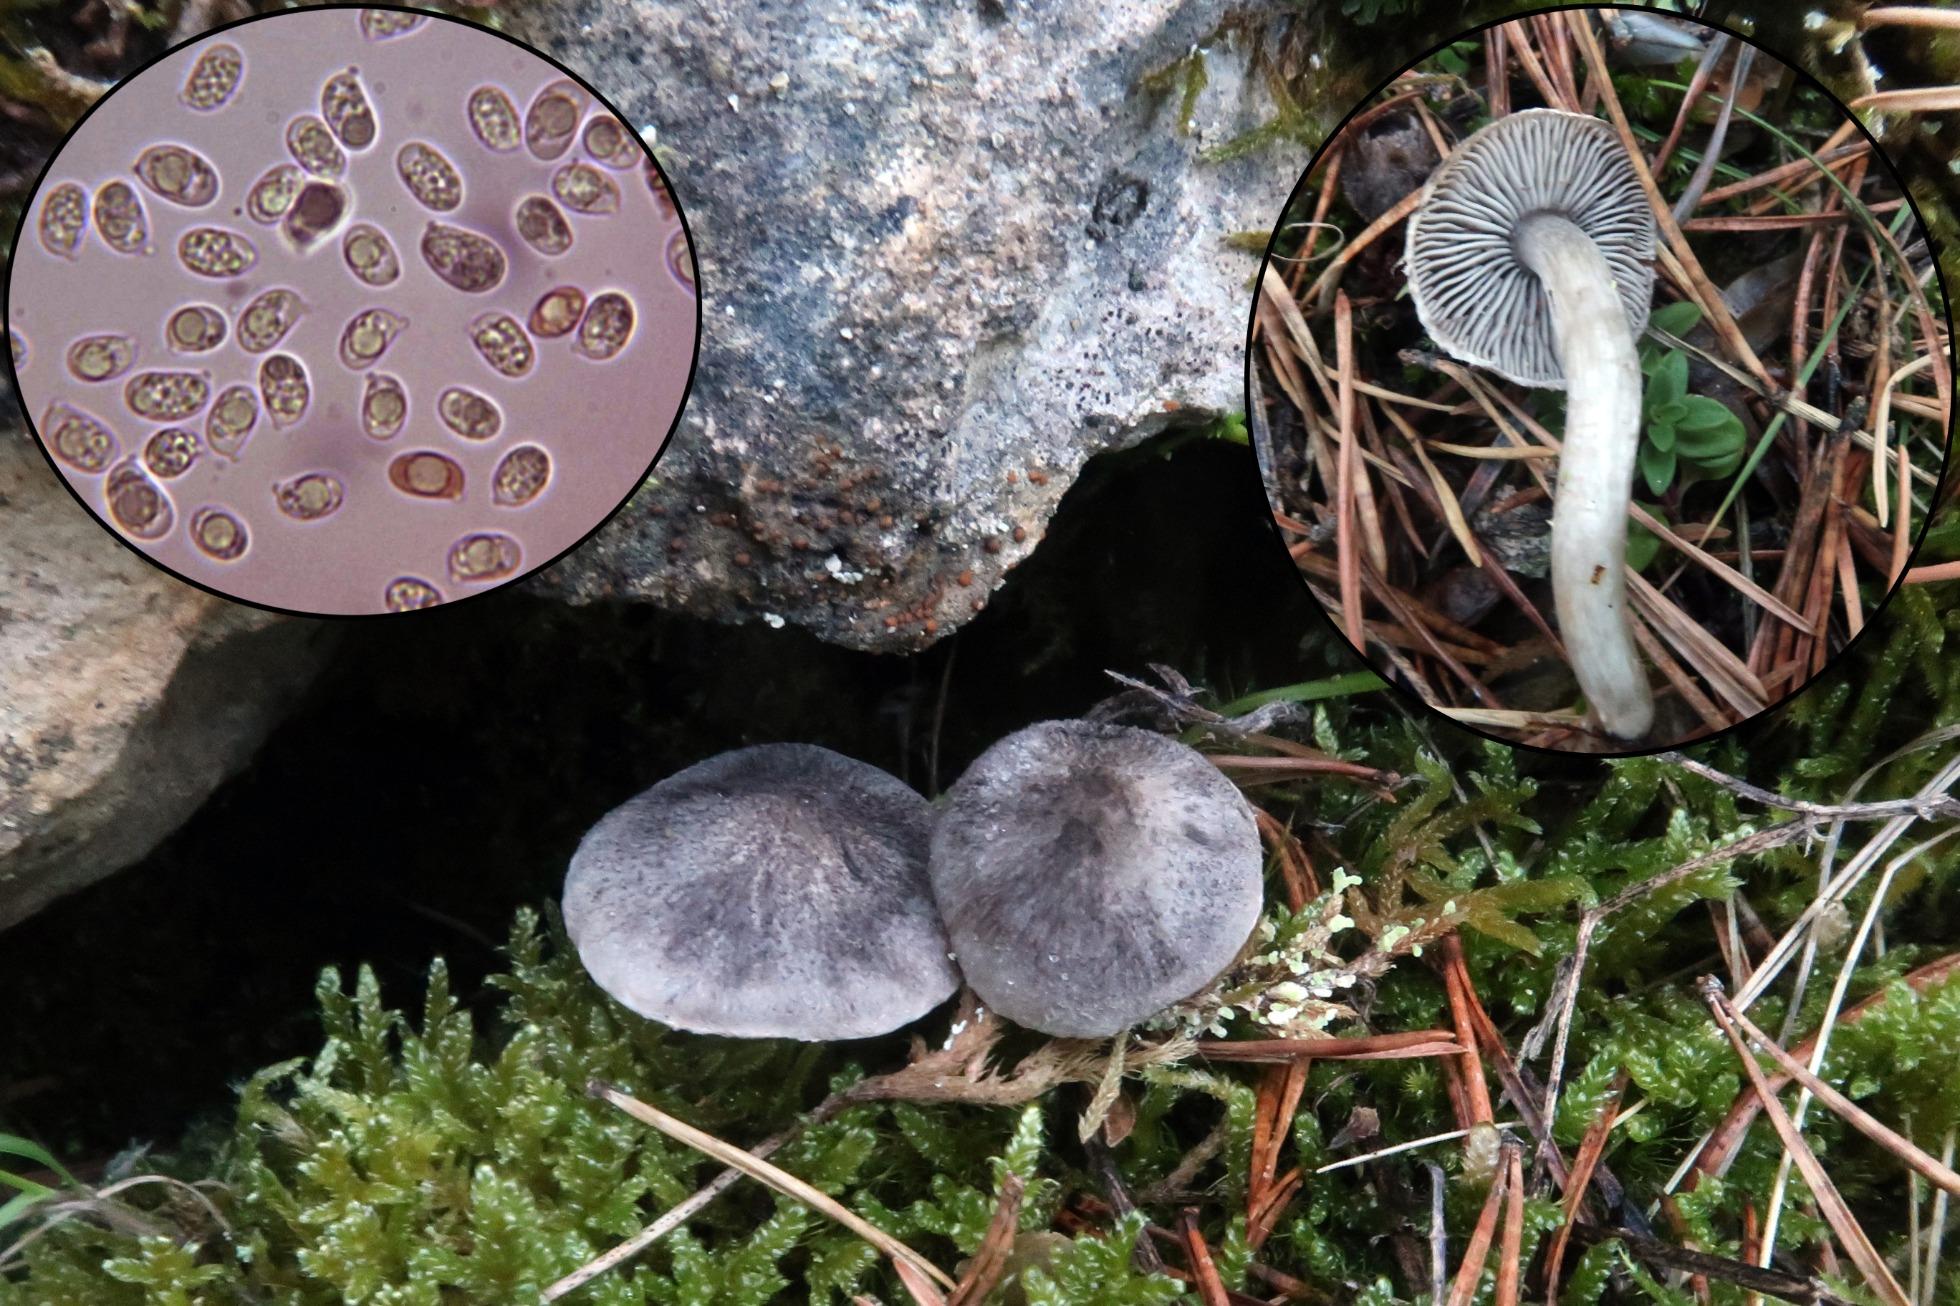 Tricholomaterreump.jpg